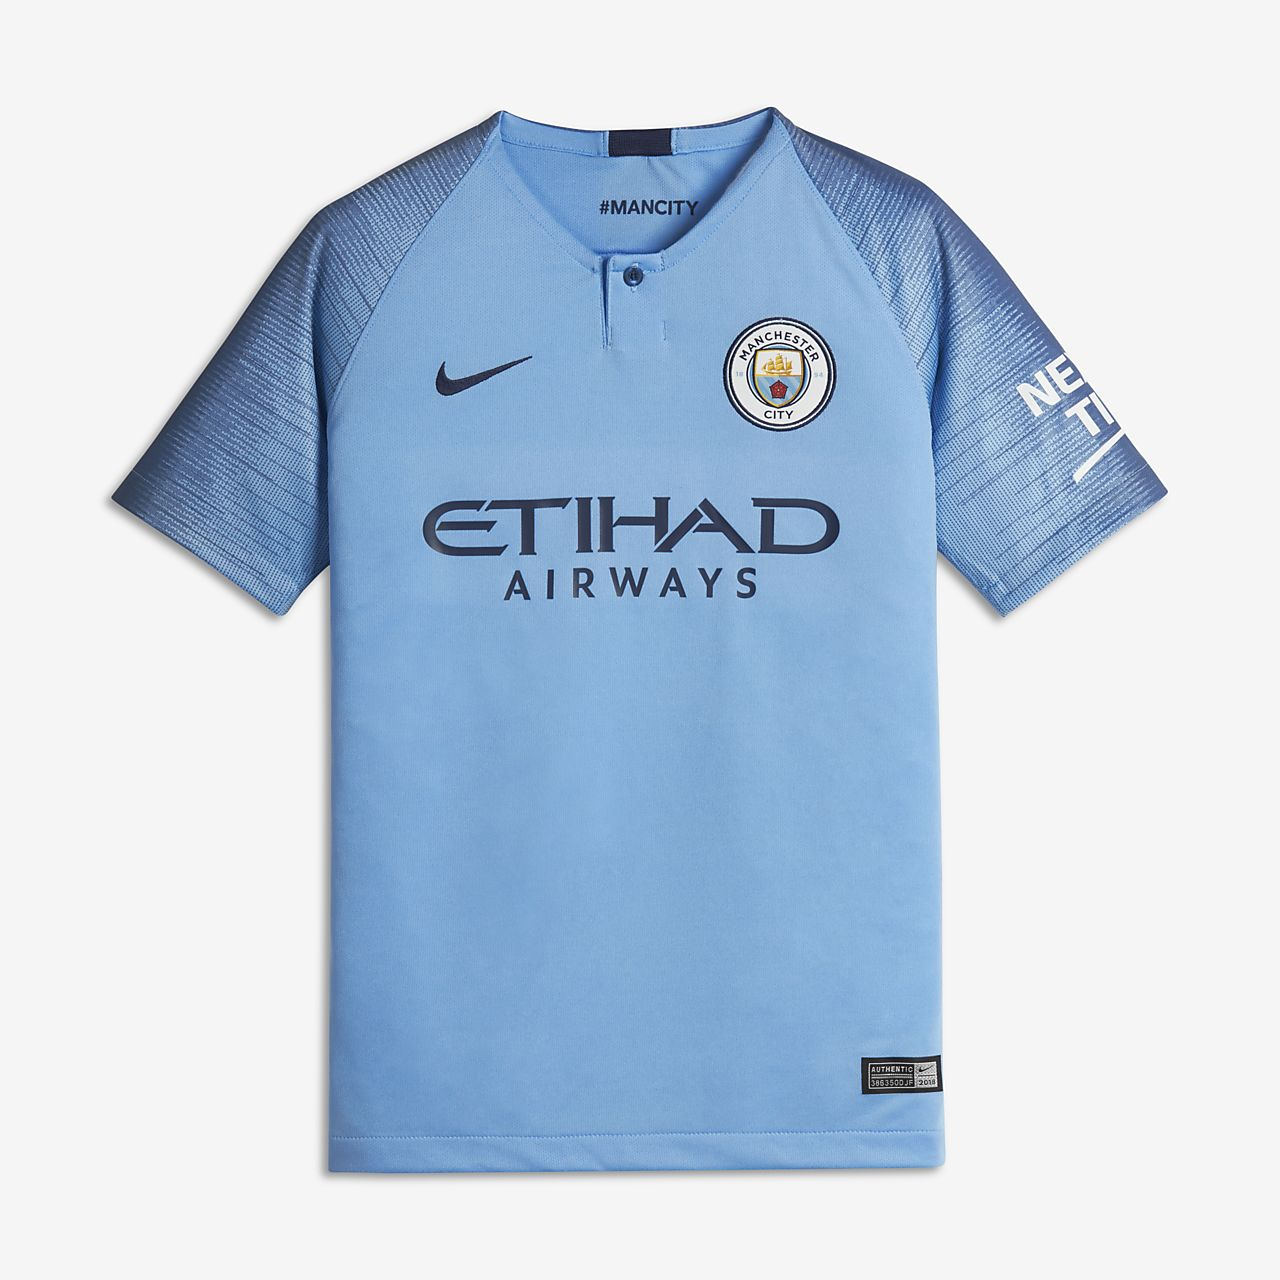 Camiseta de fútbol para niños talla grande de local Stadium del Manchester  City FC 2018  42a5ddc87583a